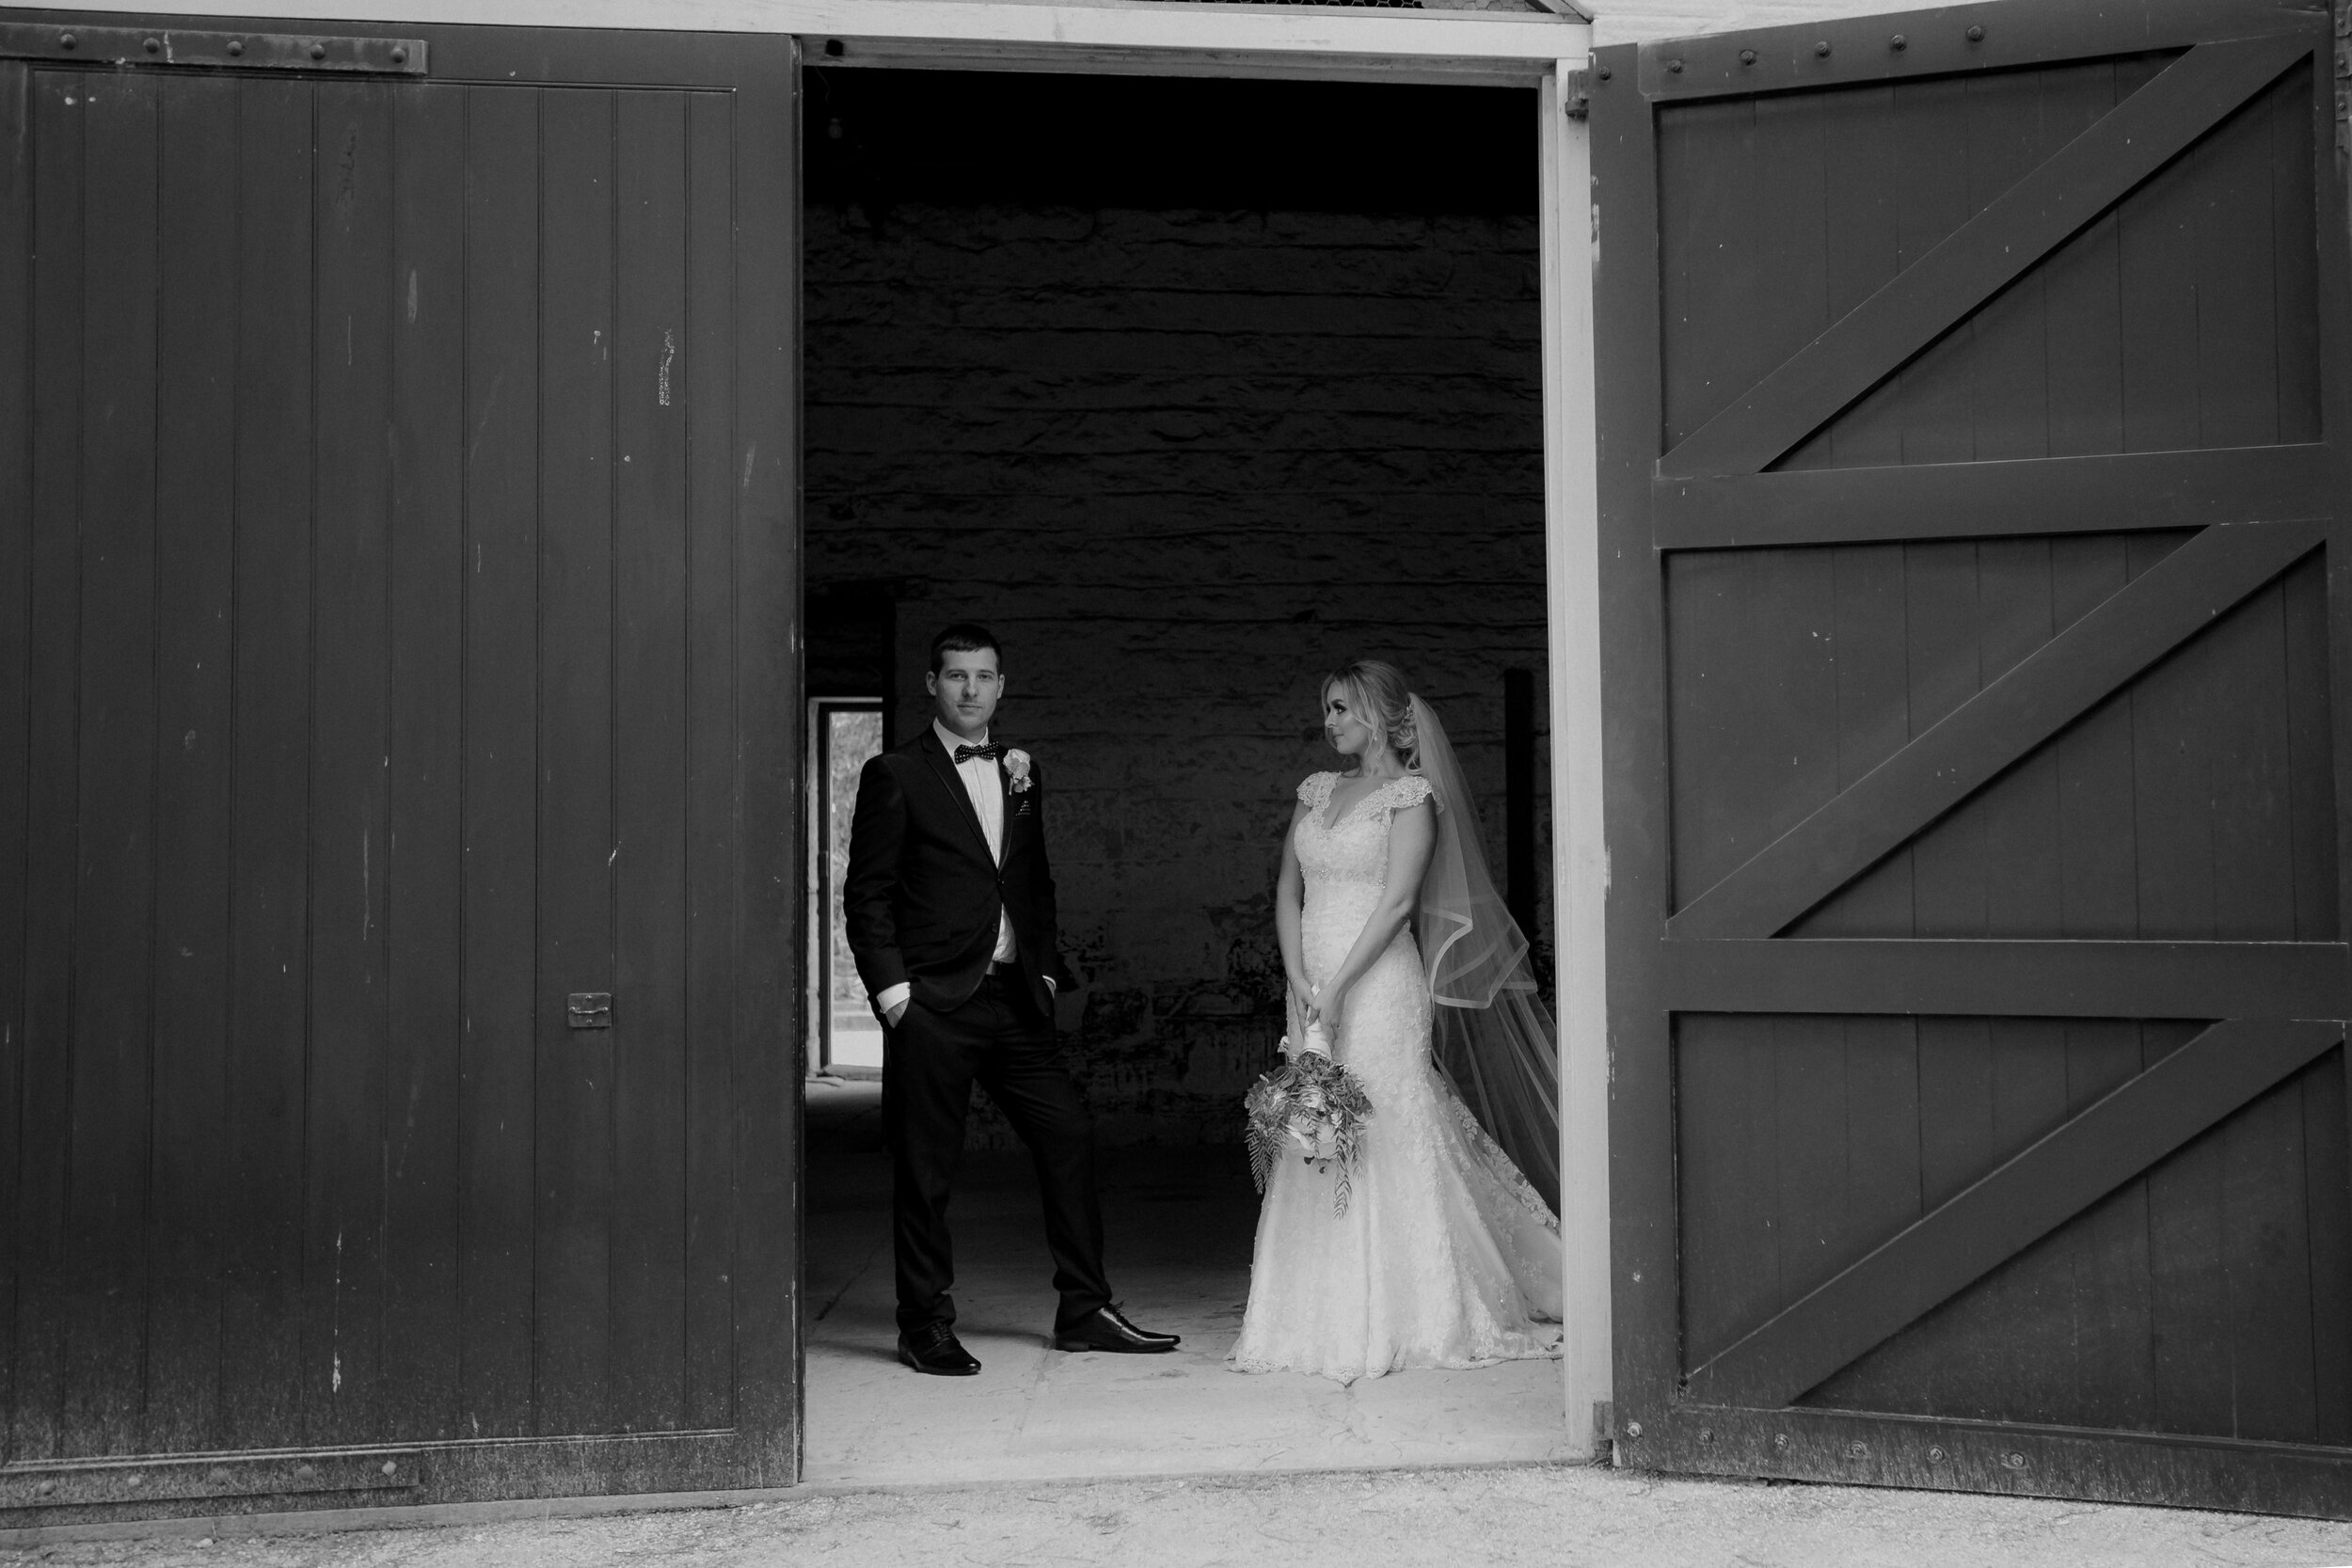 Ollie Brunt, Sydney Wedding Photographer